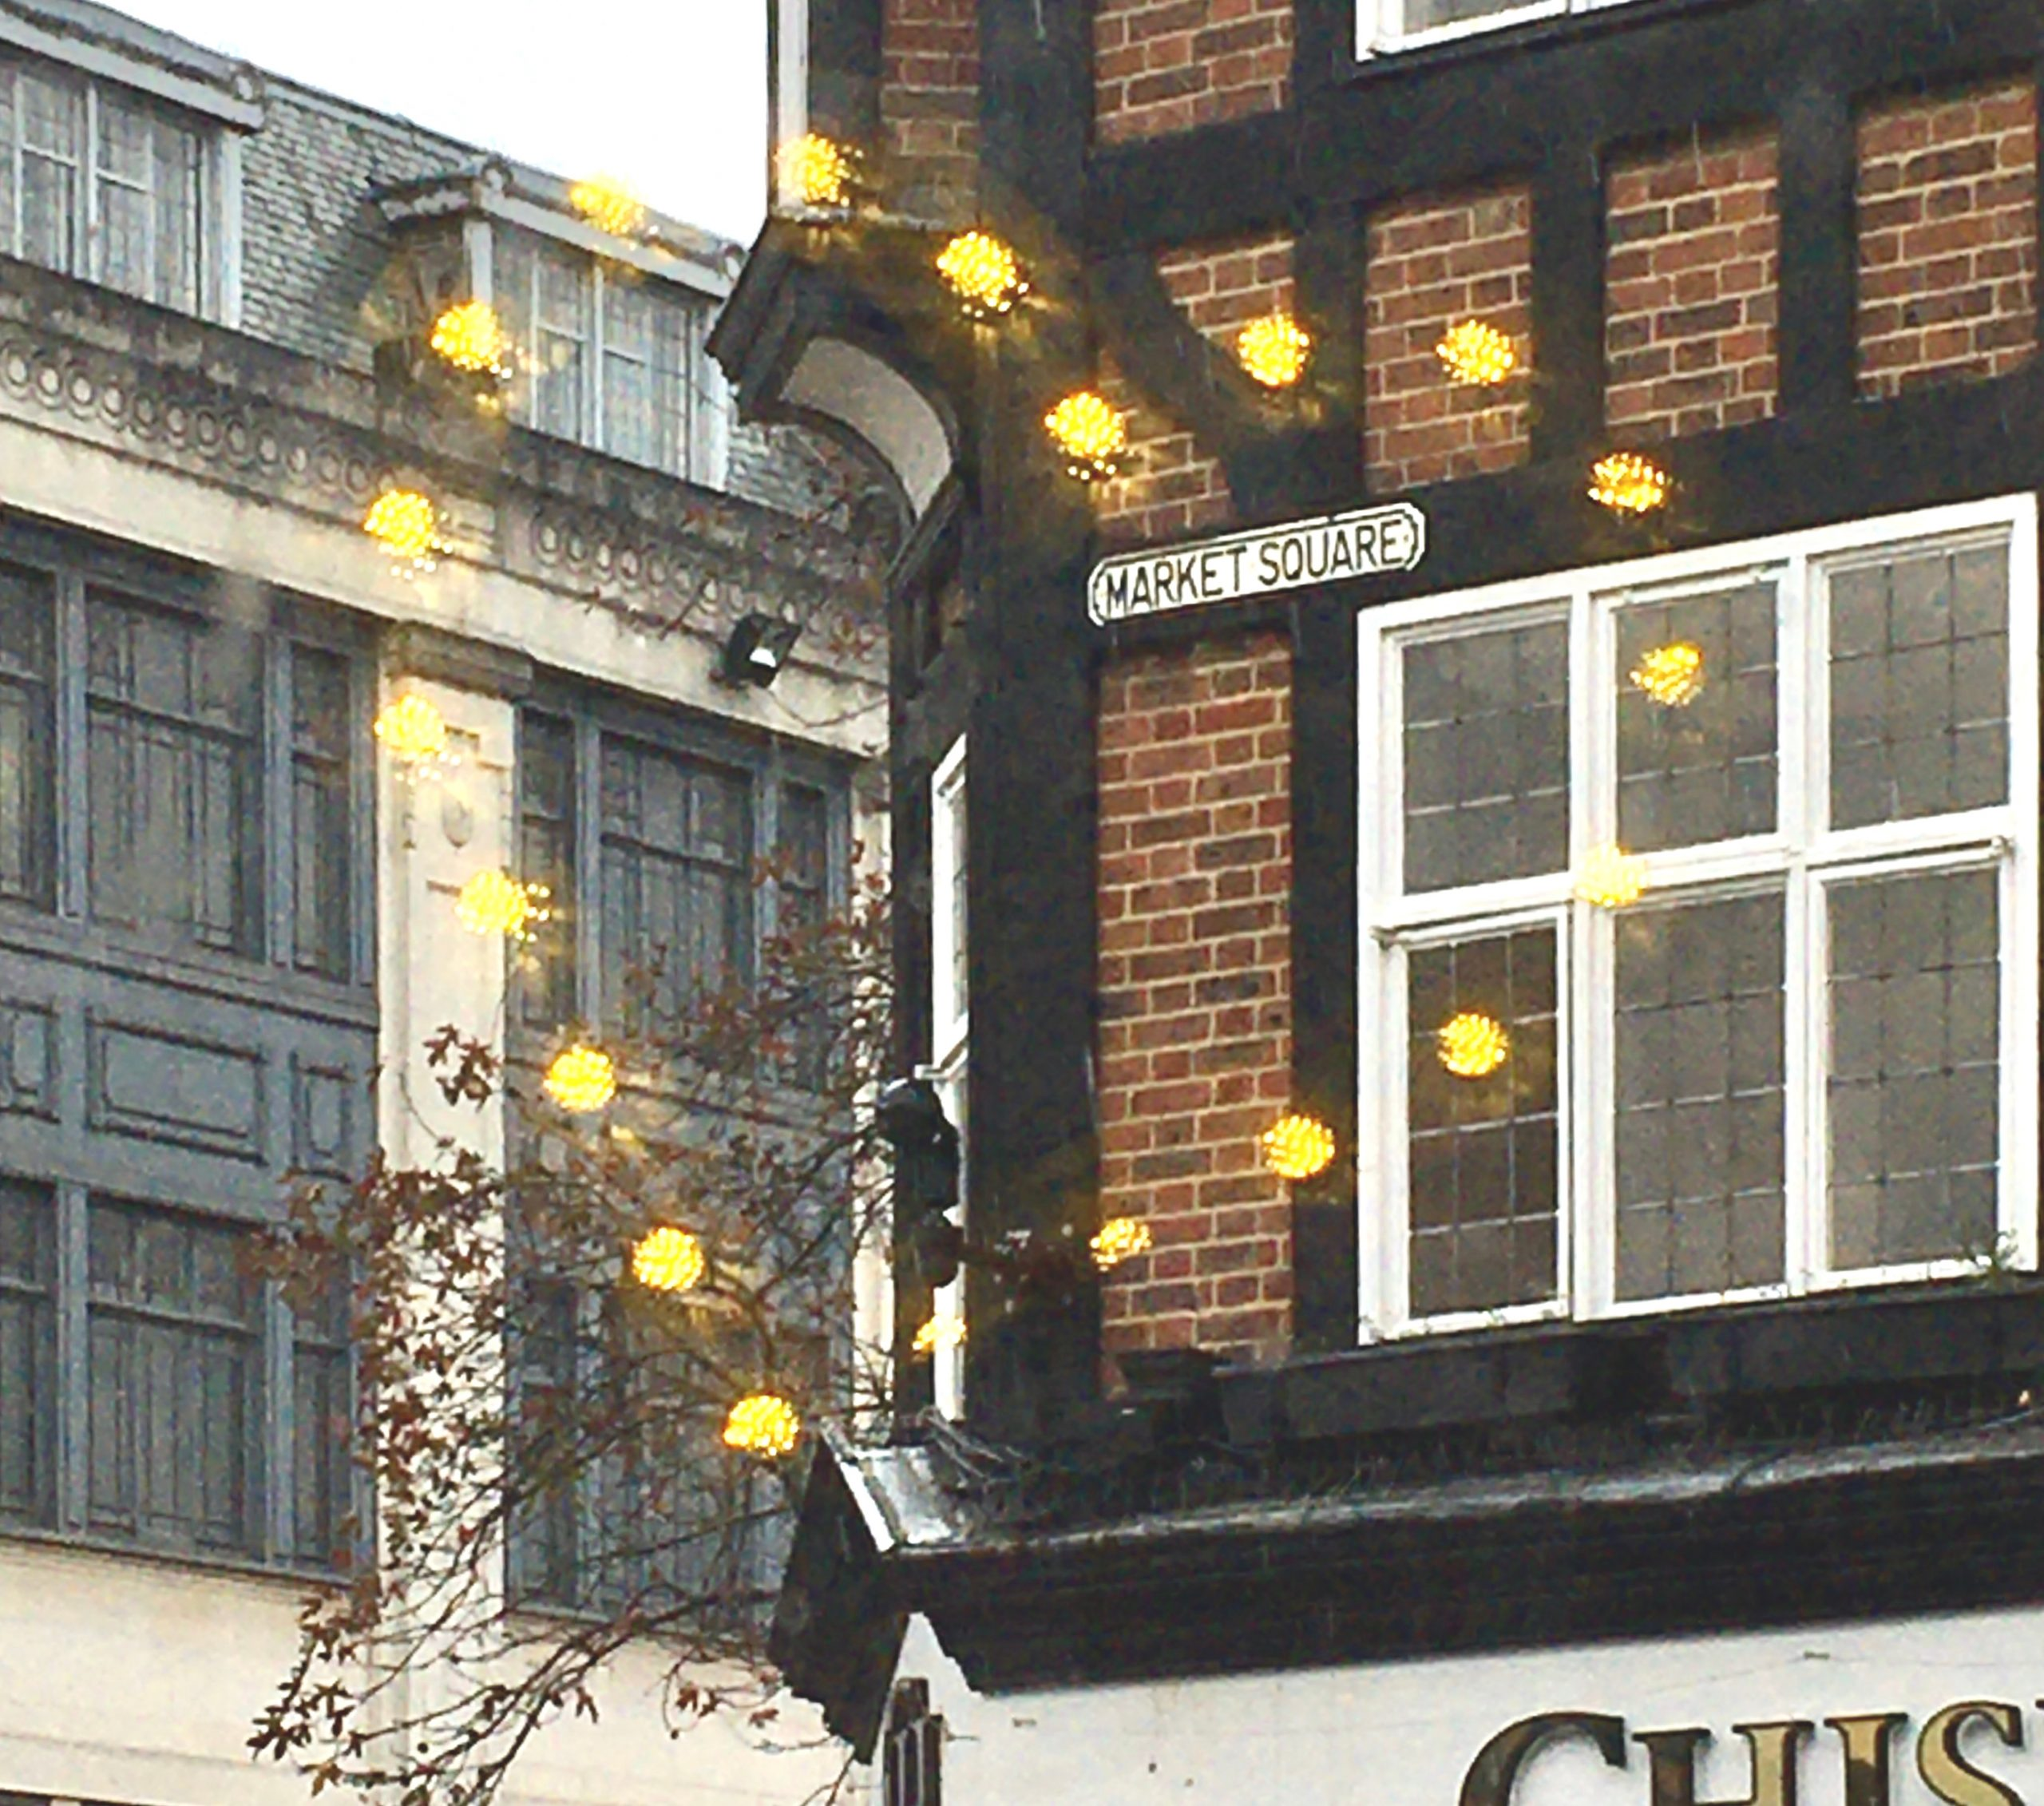 heart of lights around market square roadsign